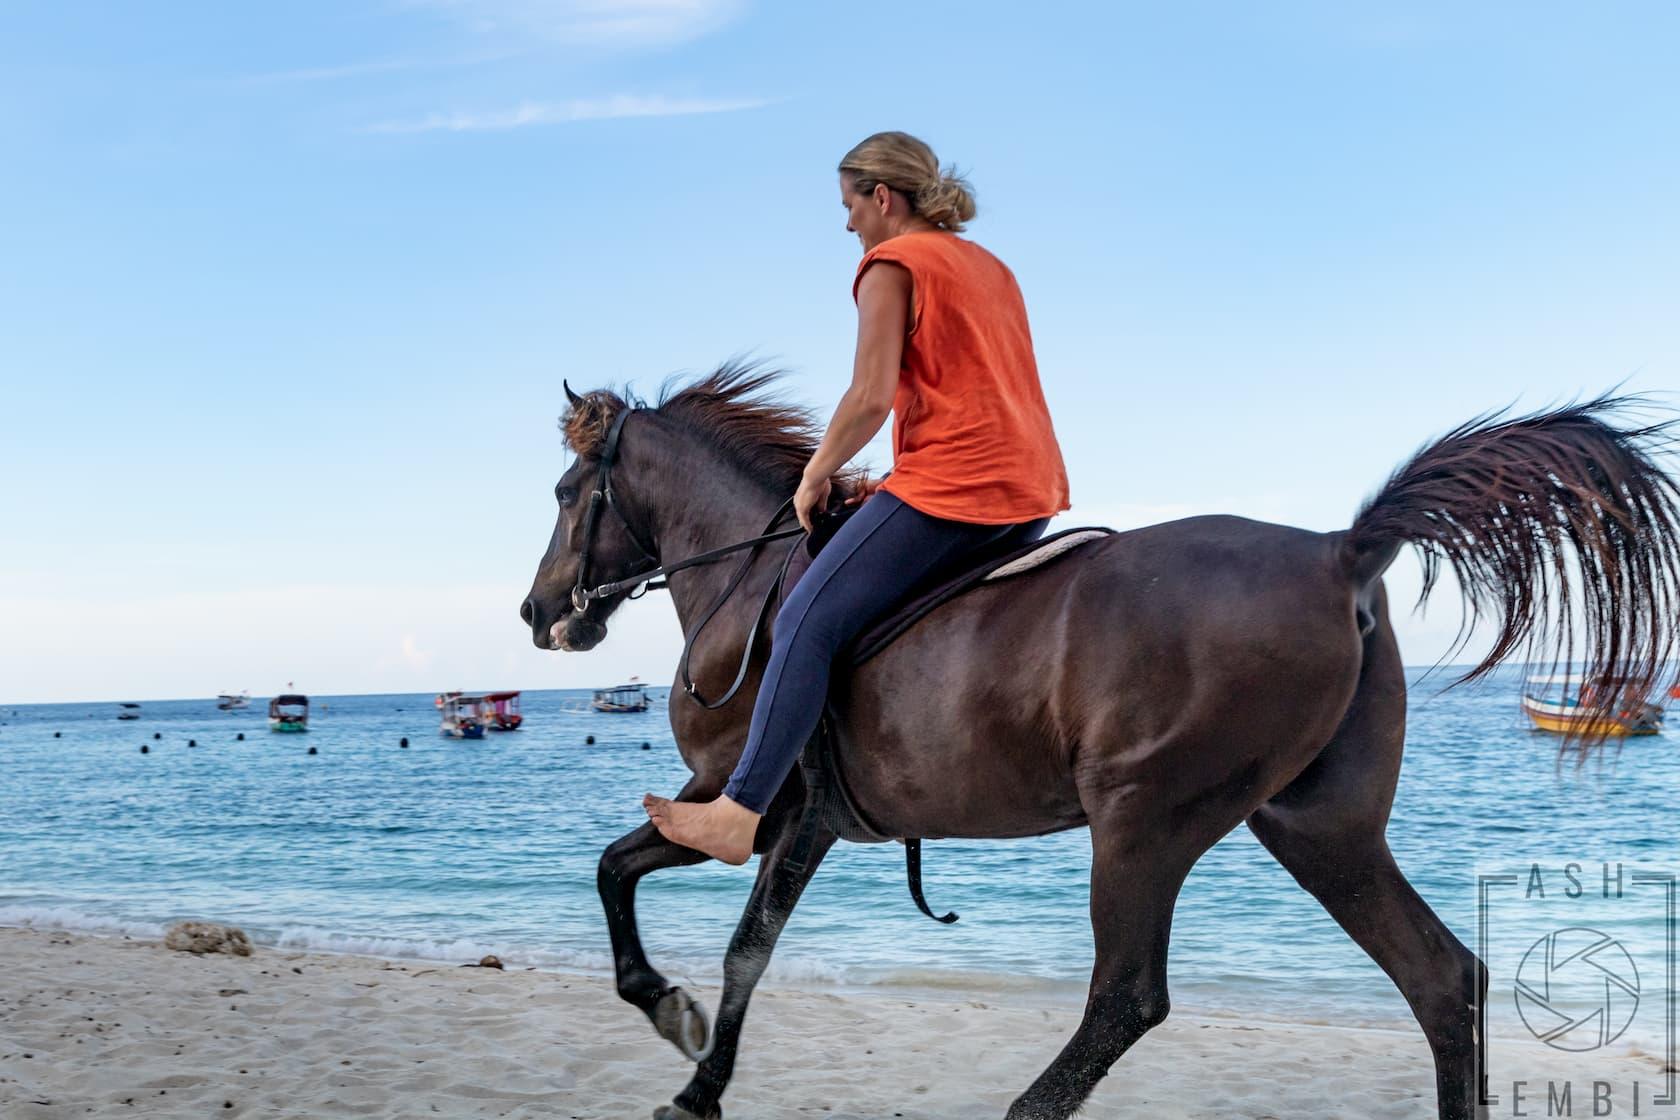 Horse riding in Gili Trawangan